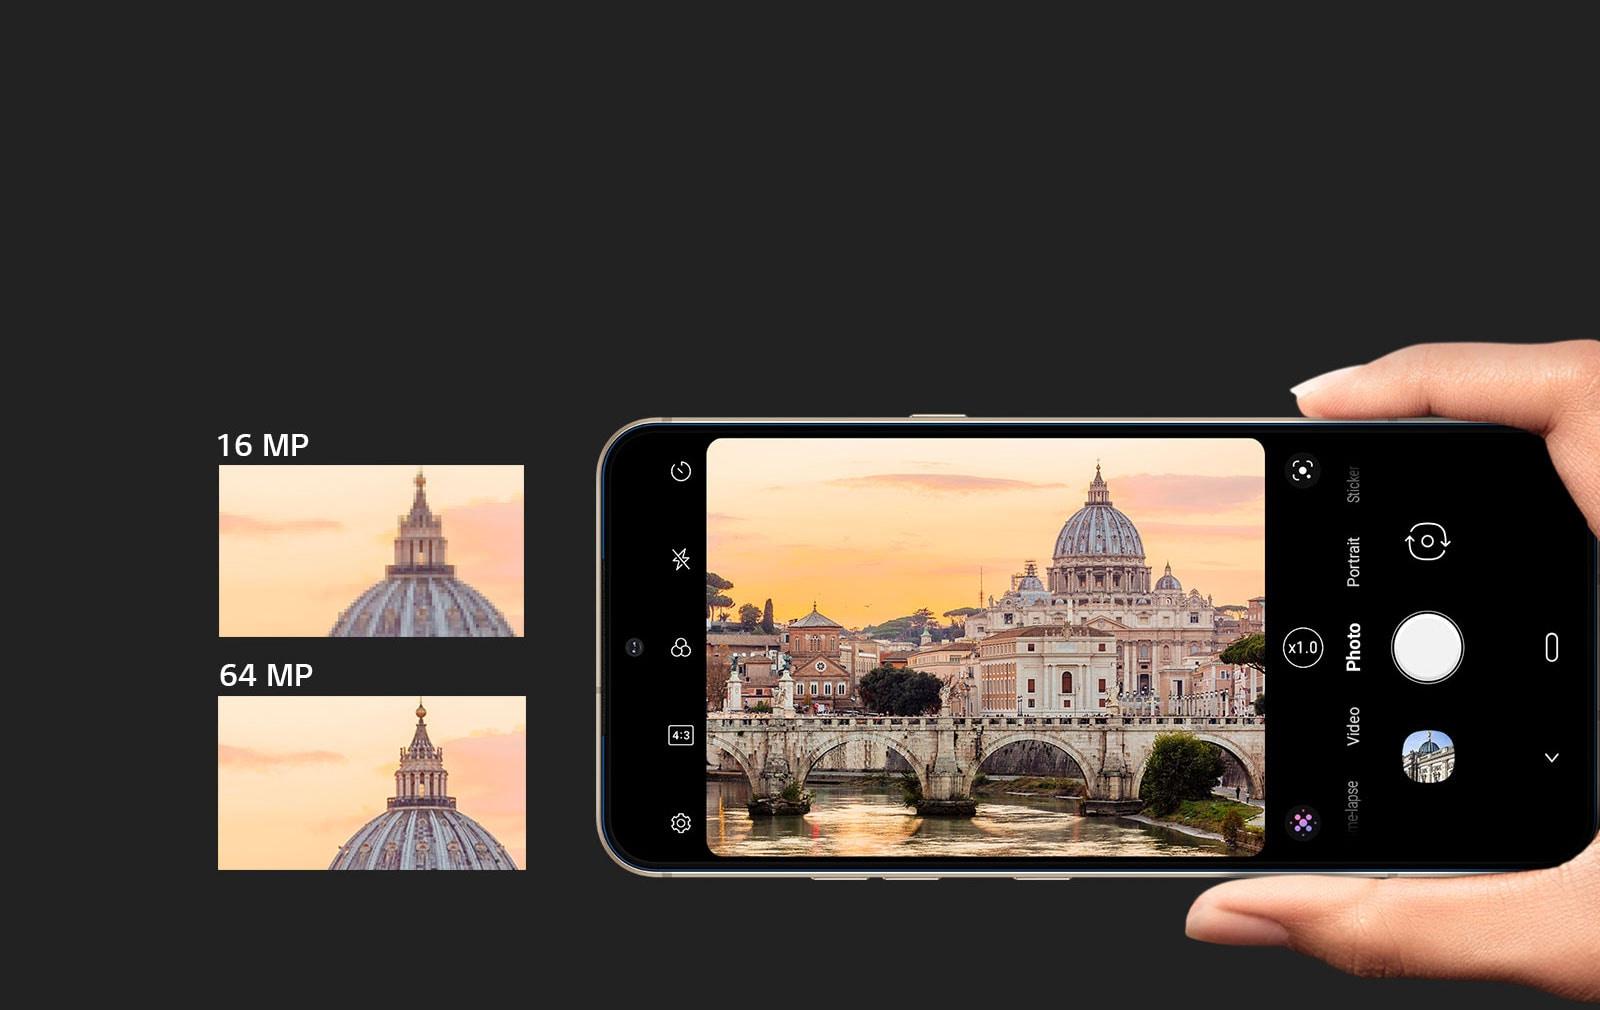 Teléfono para tomar fotografías de edificios con cámara trasera de 16 MP y 64 MP